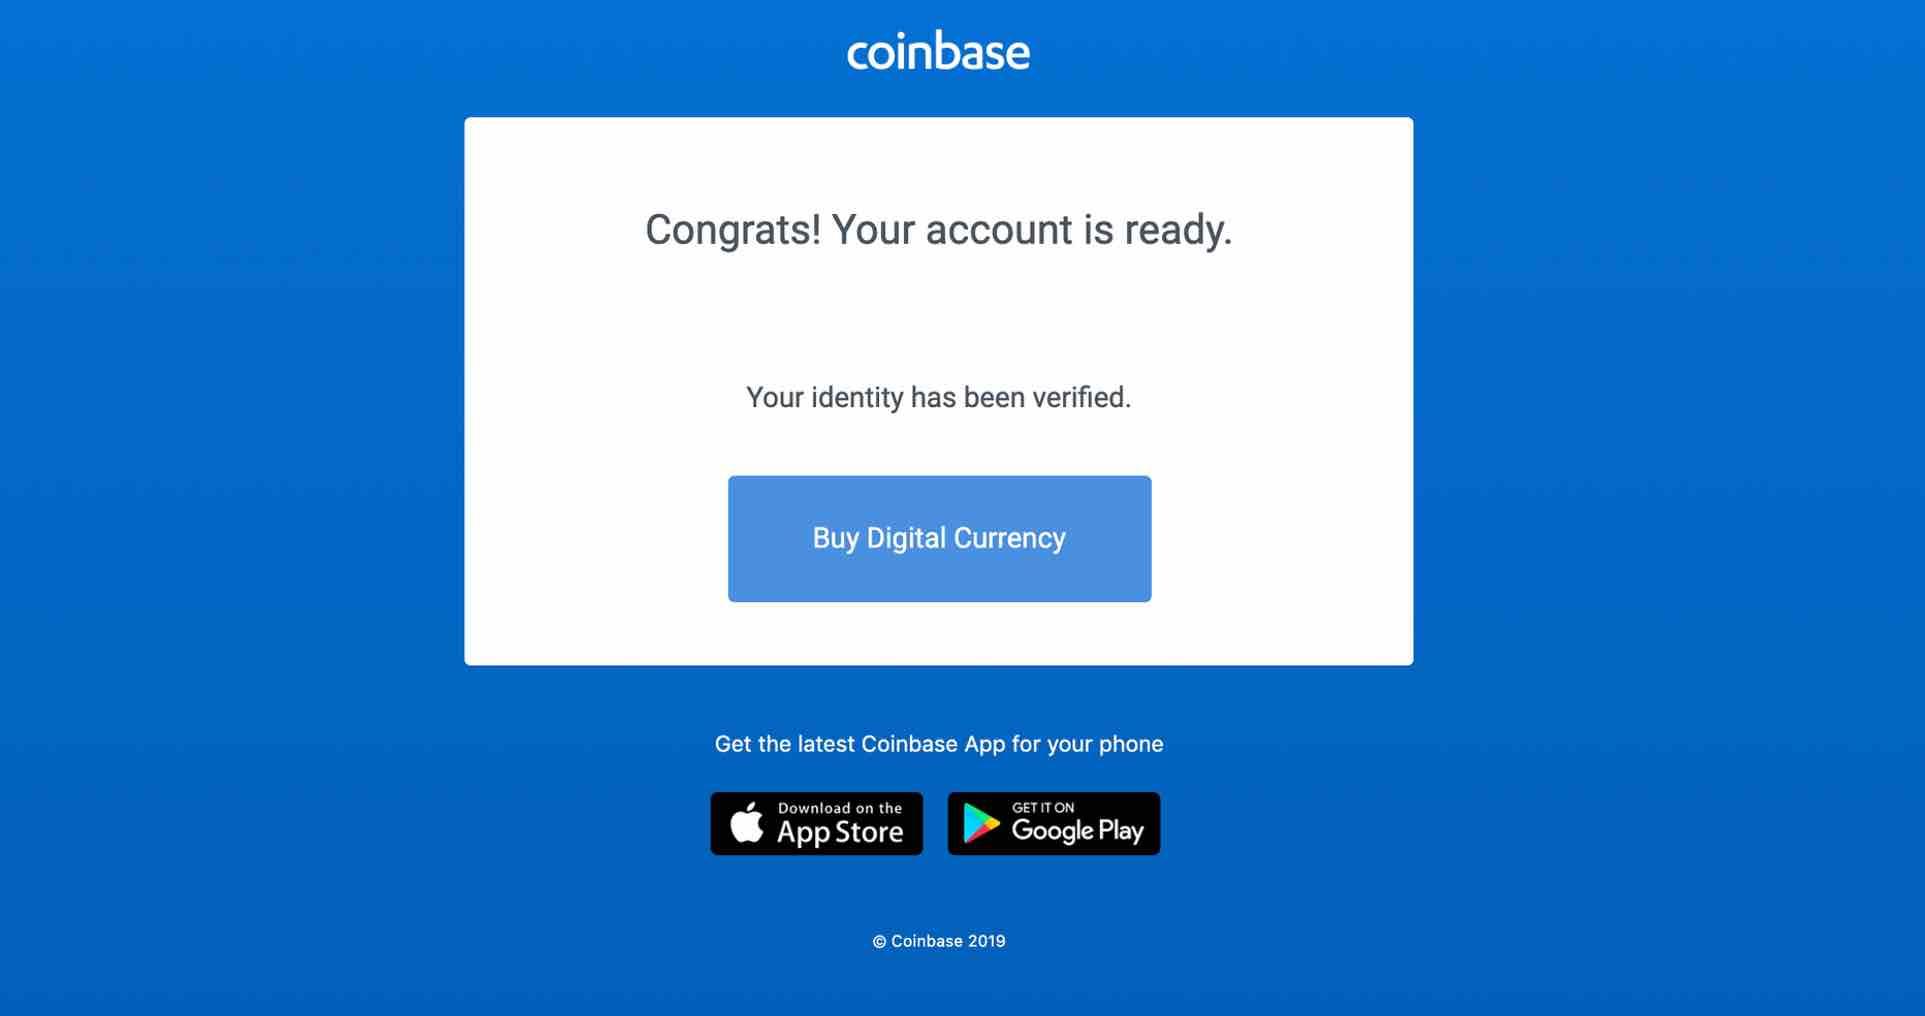 coinbase verified